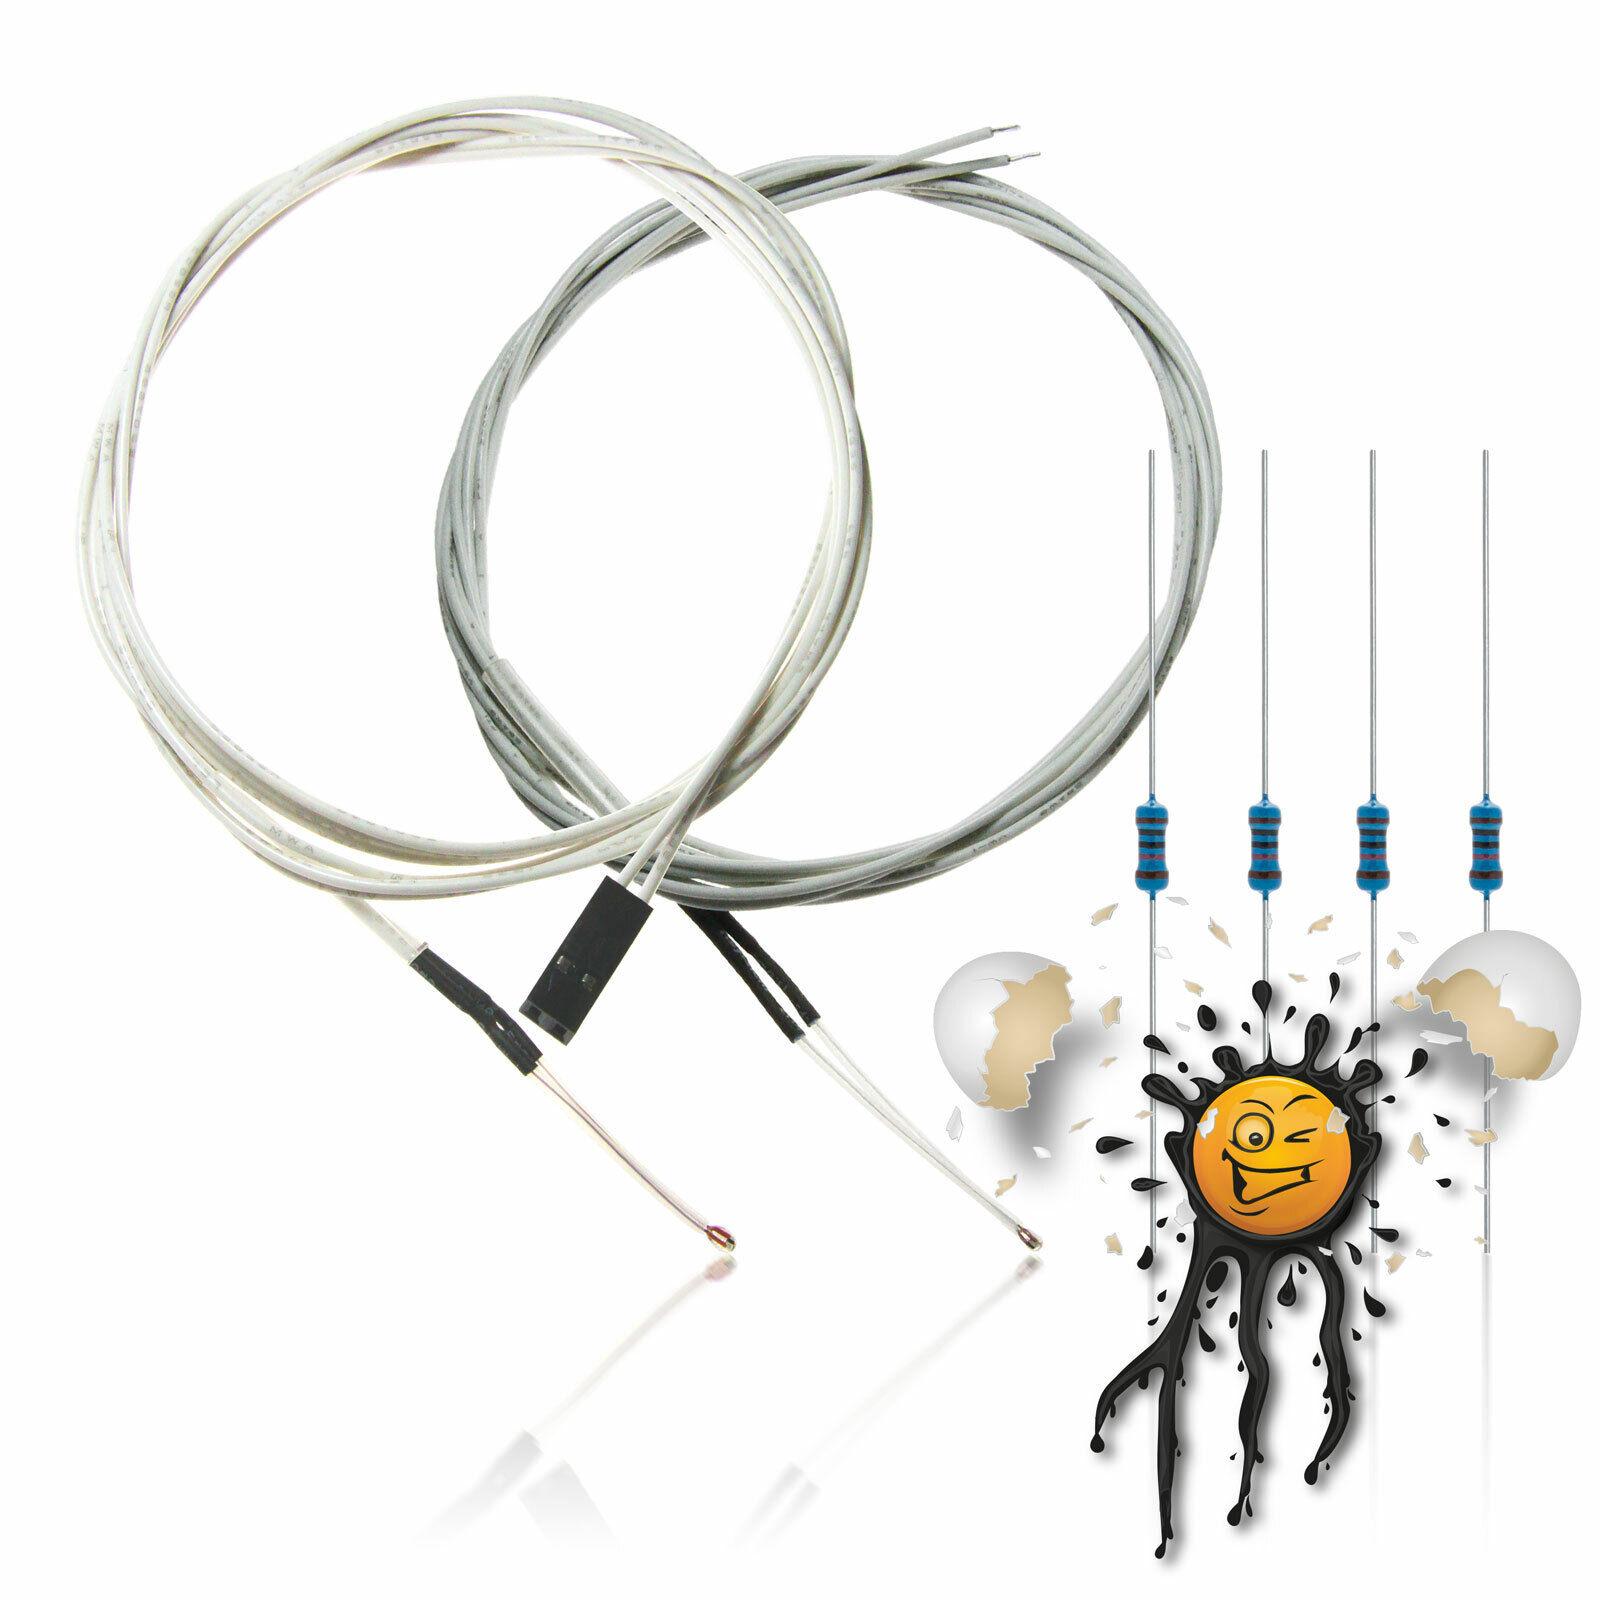 50°C bis 110°C  Thermosensor Temperatursensor NTC 1k Temperaturfühler NTC1K